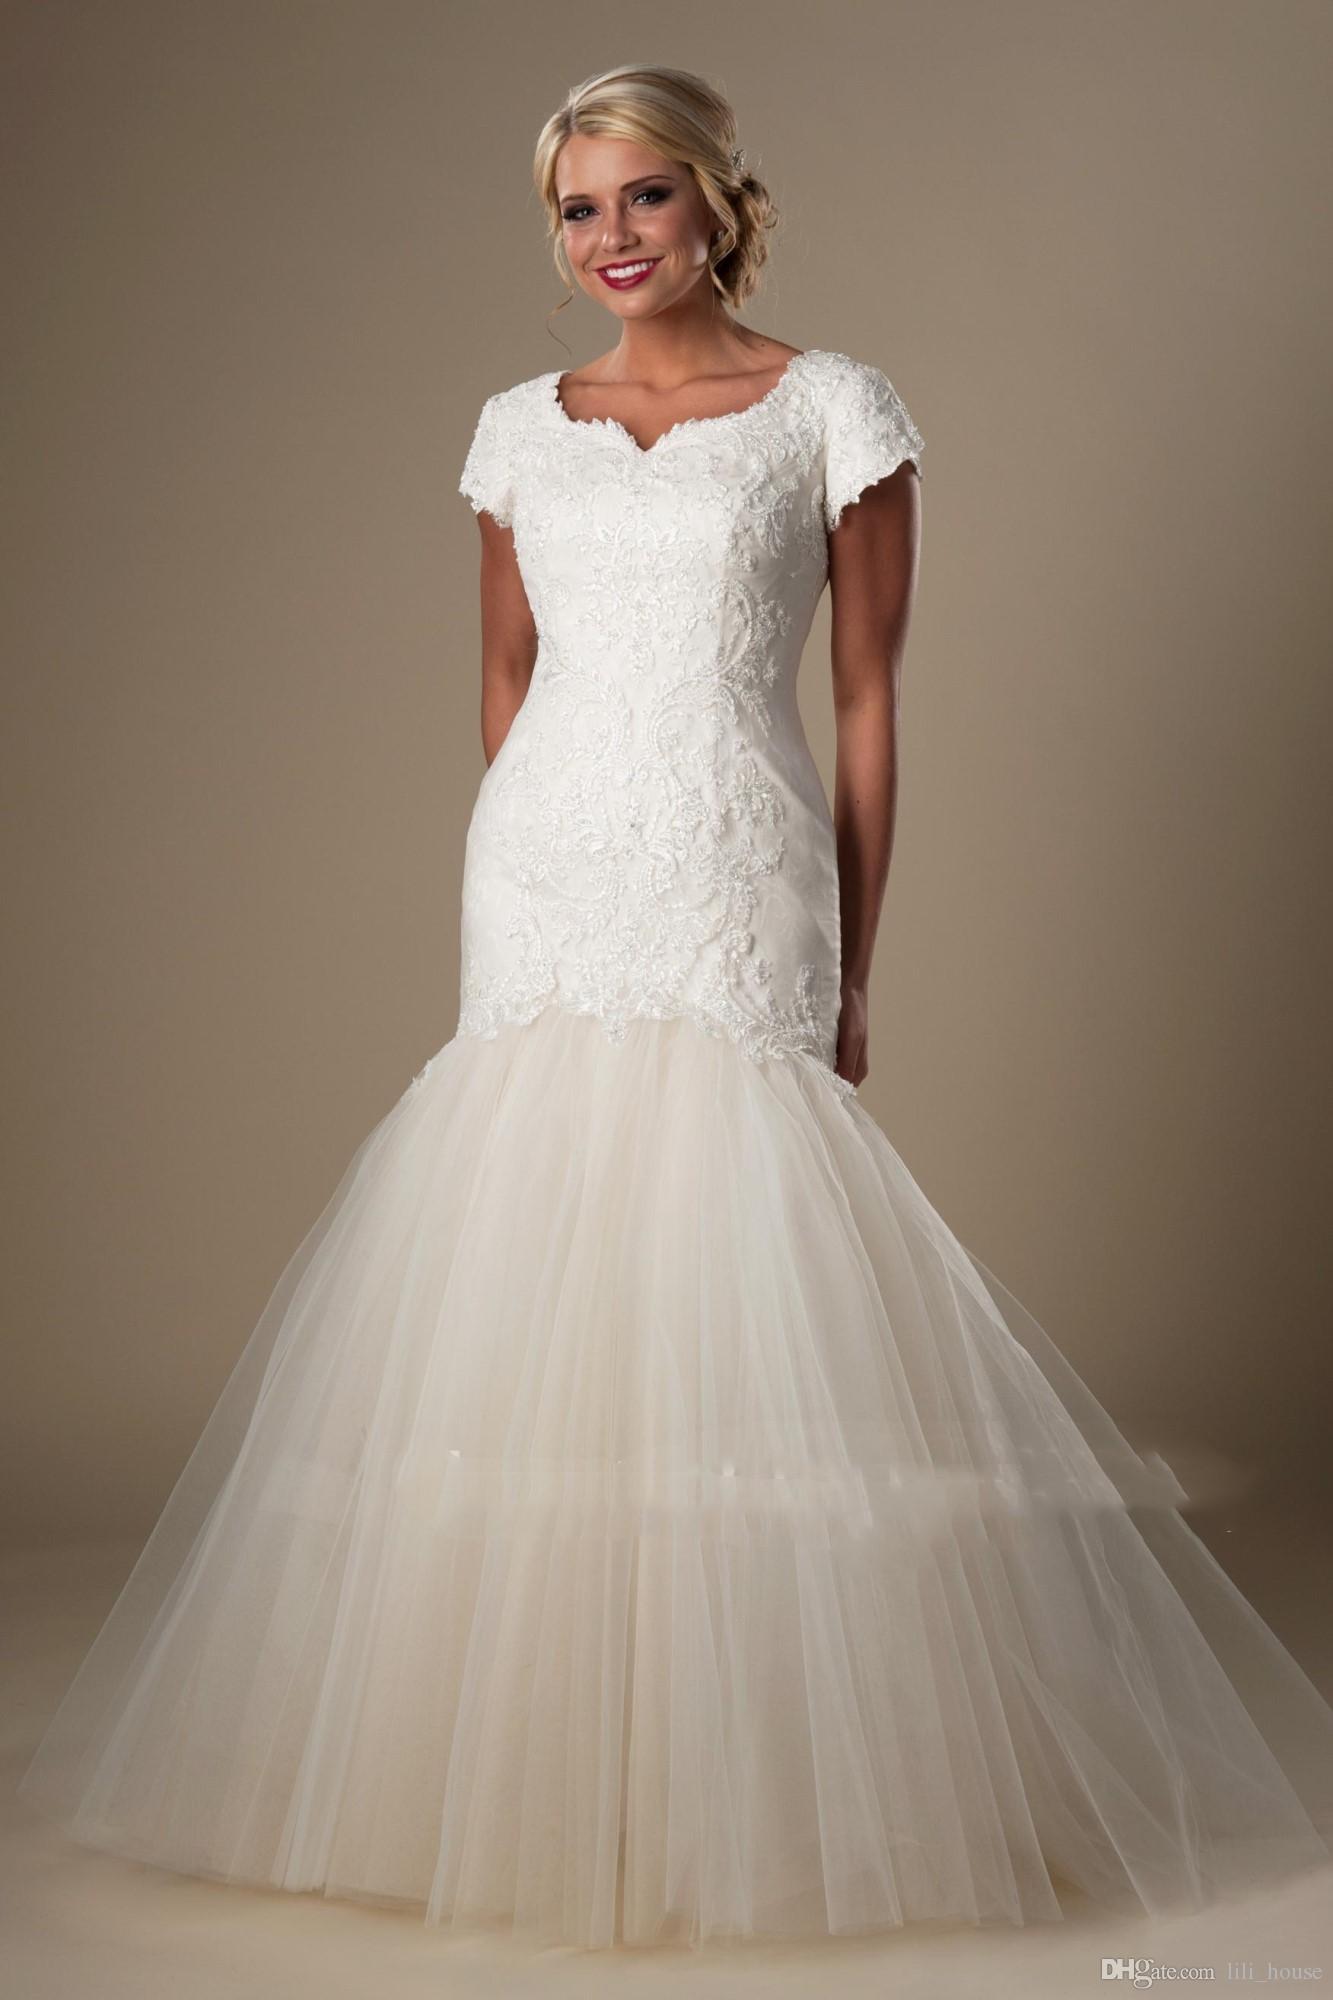 Jessica hoversen wedding